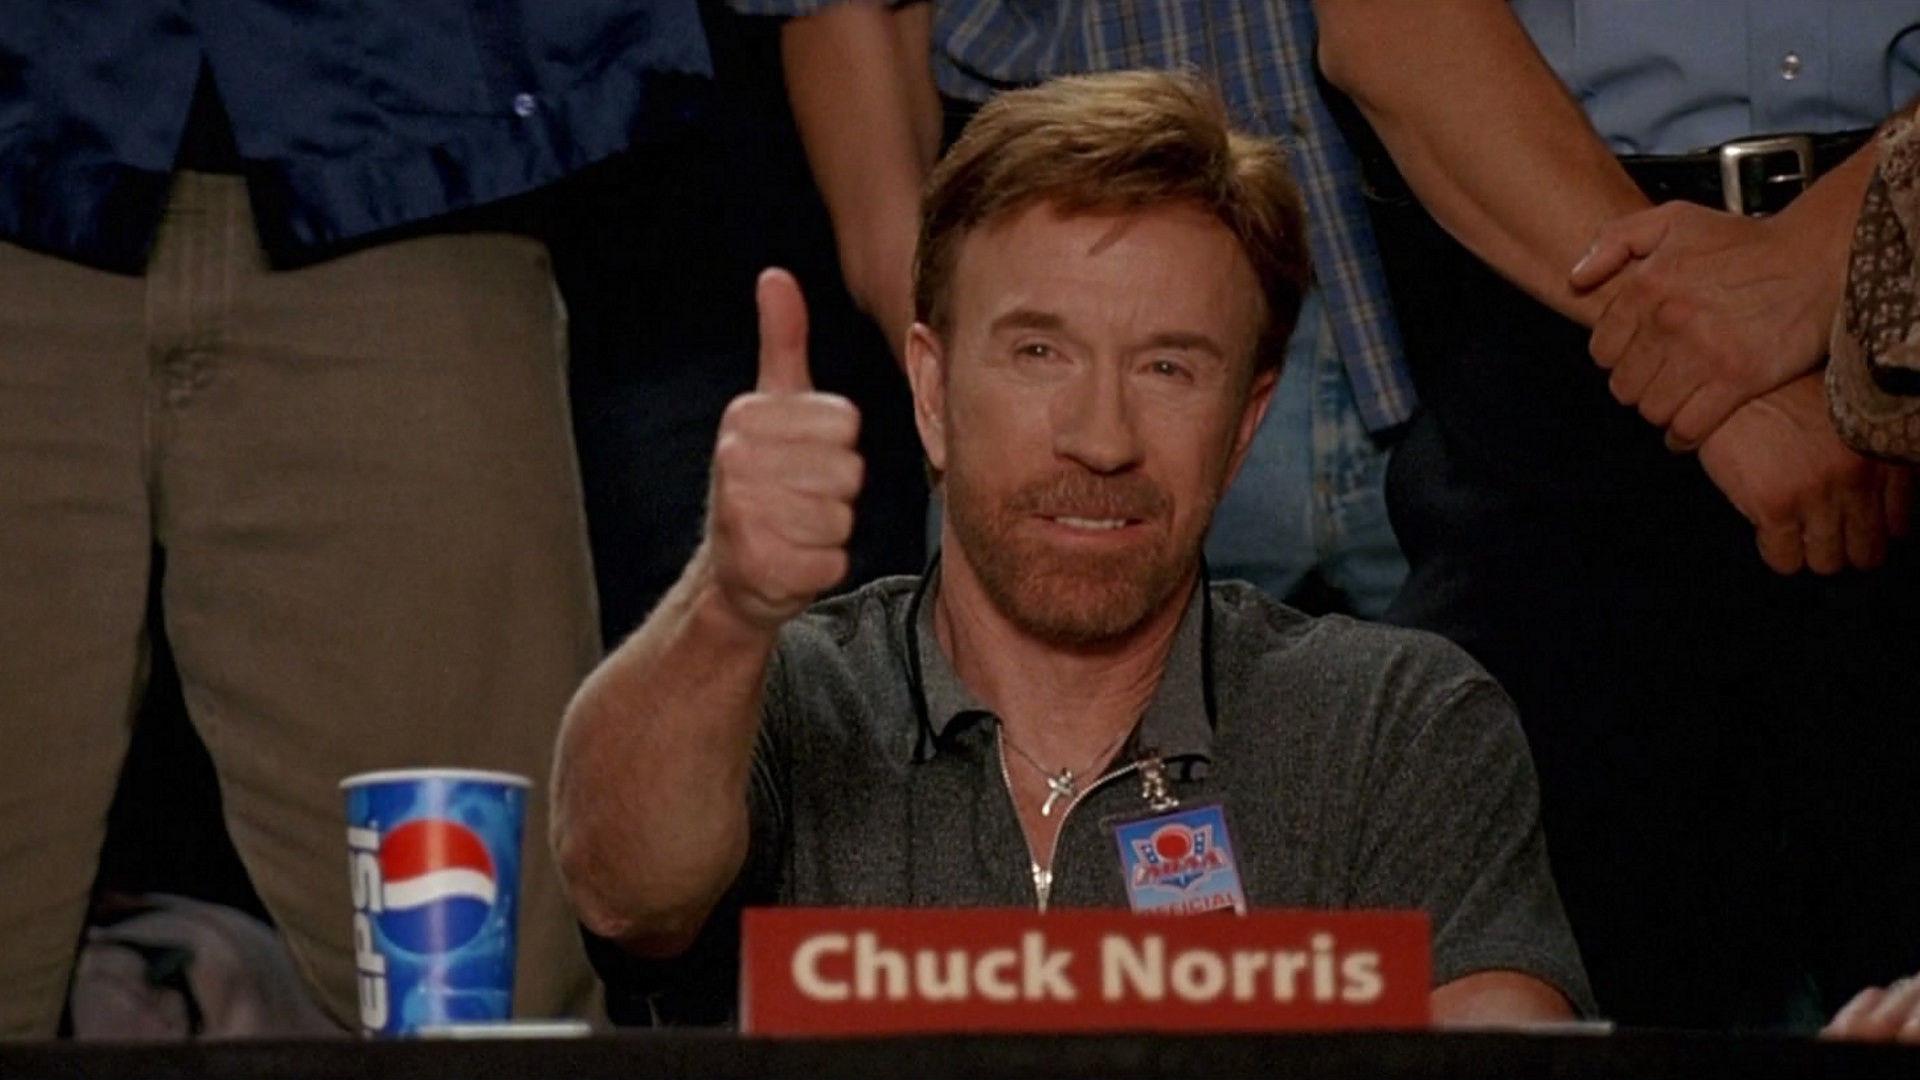 Arnold Schwarzenegger Quotes Wallpaper Chuck Norris Wallpaper 66 Images